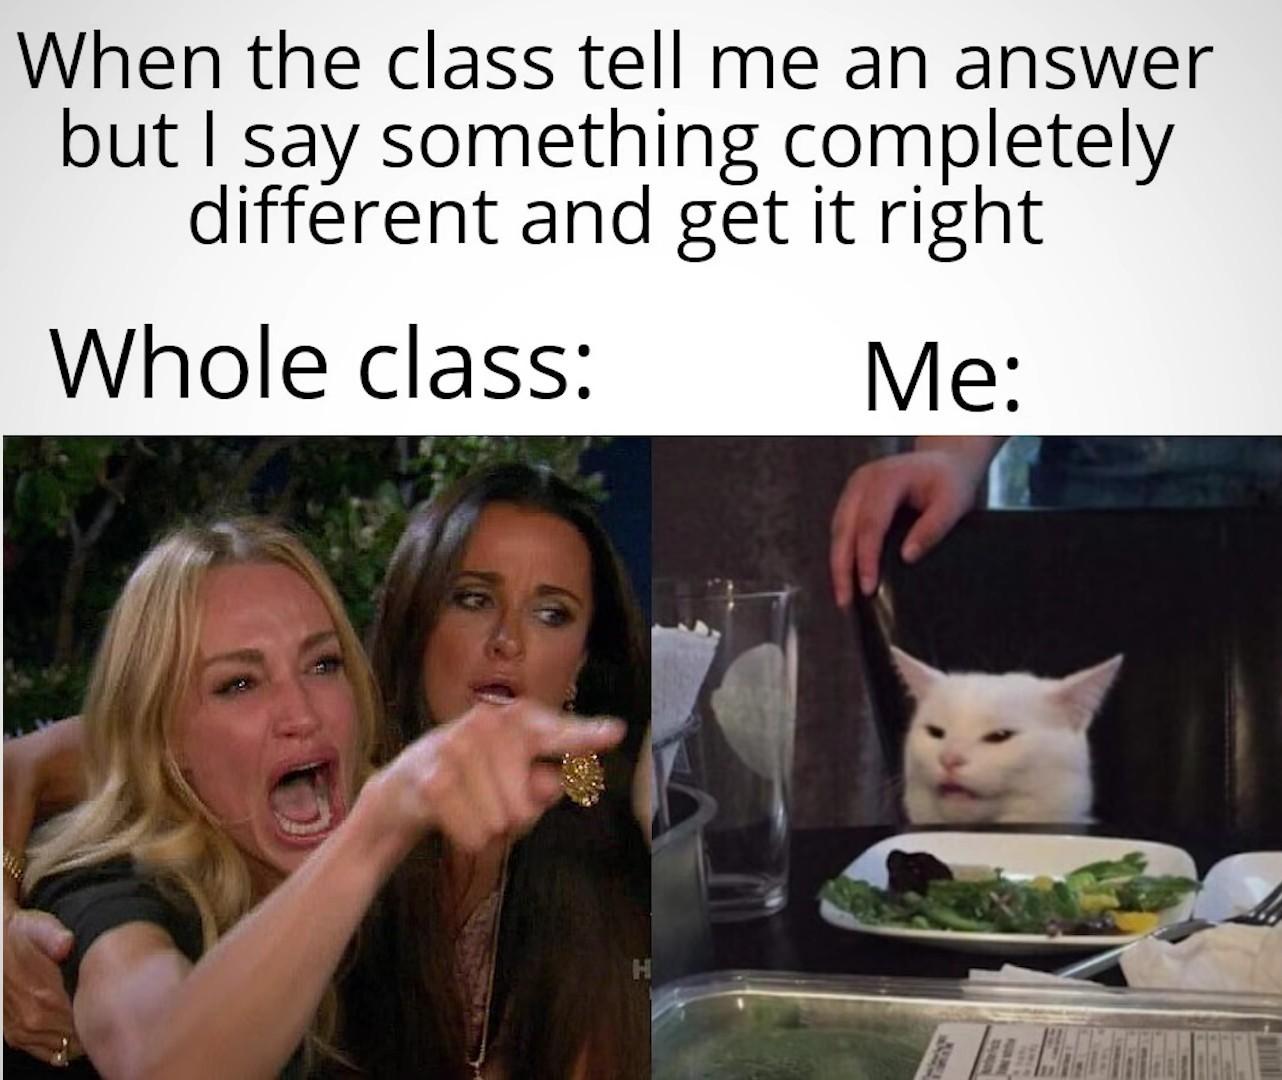 You right - meme